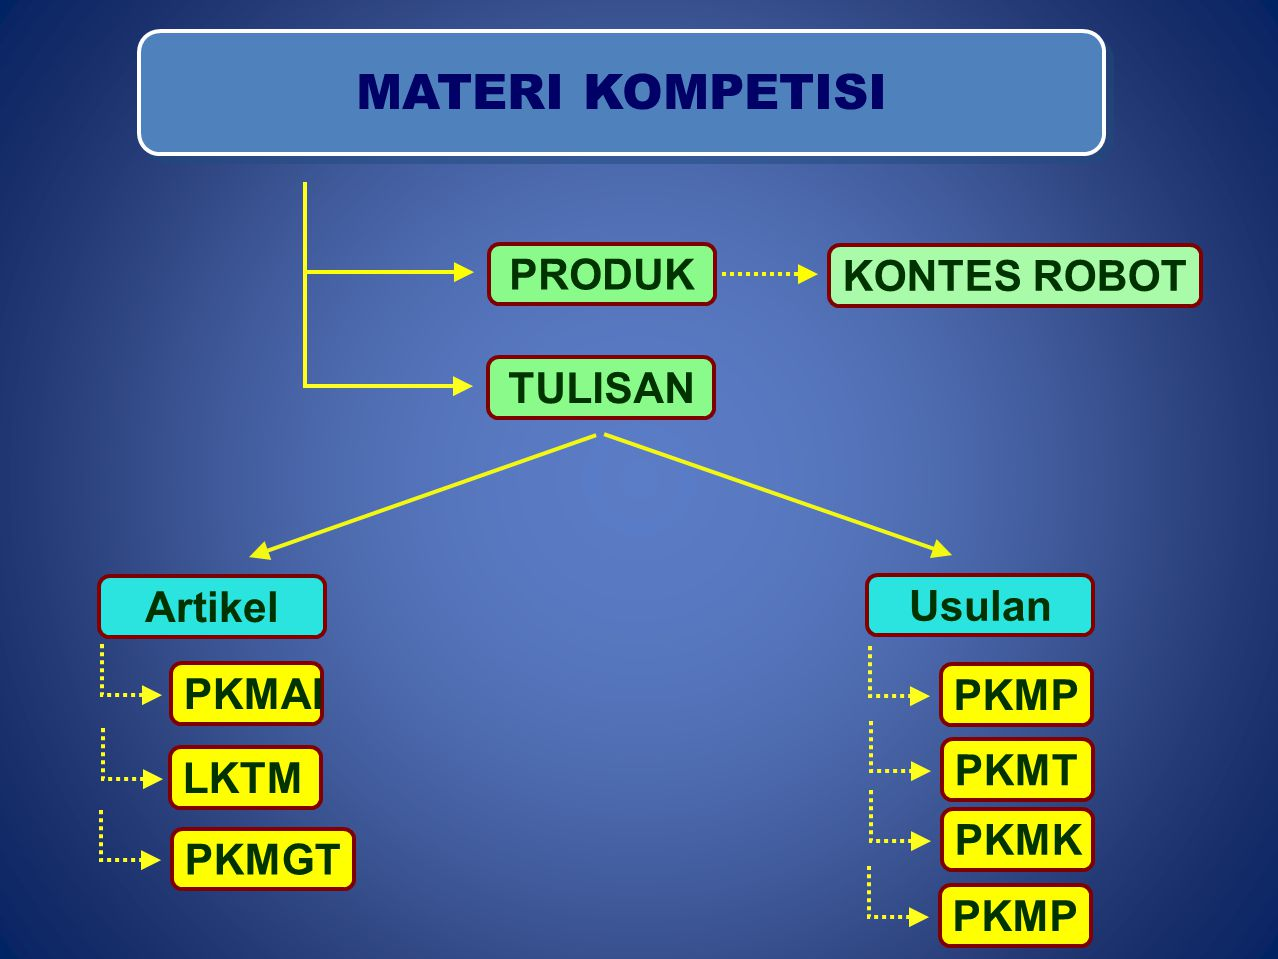 KOMPETISI ILMIAH PKM-GT KONTES ROBOT PKM-AI MAWAPRES Pendanaan Hadiah PKMP PKMKC PKMK PKMM PKMT Lainnya